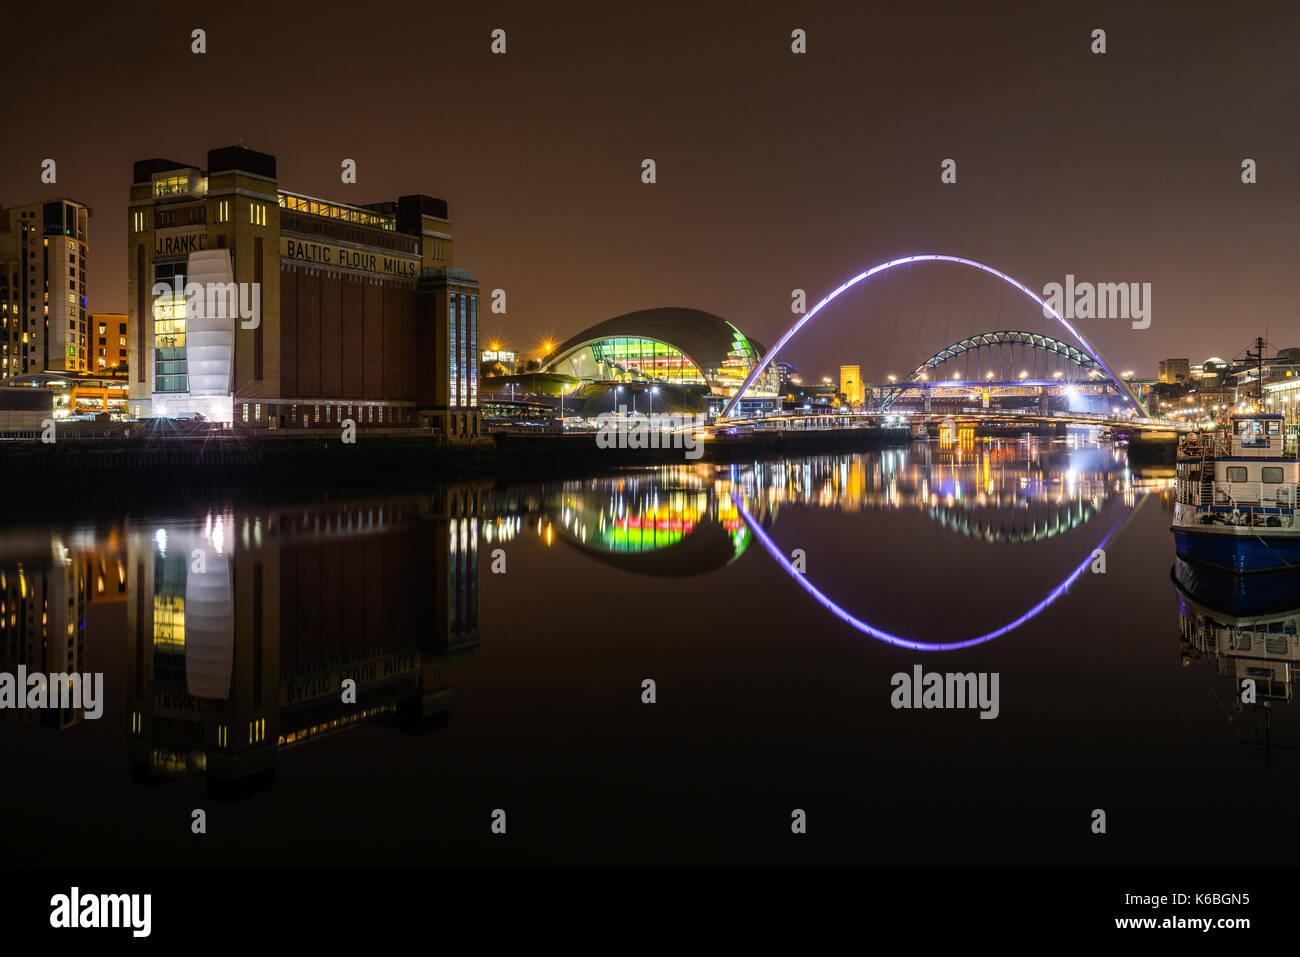 The Newcaste-Upon-Tyne/Gateshead quayside at night, showing the Baltic, Sage, Milennium and Tyne bridges Stock Photo